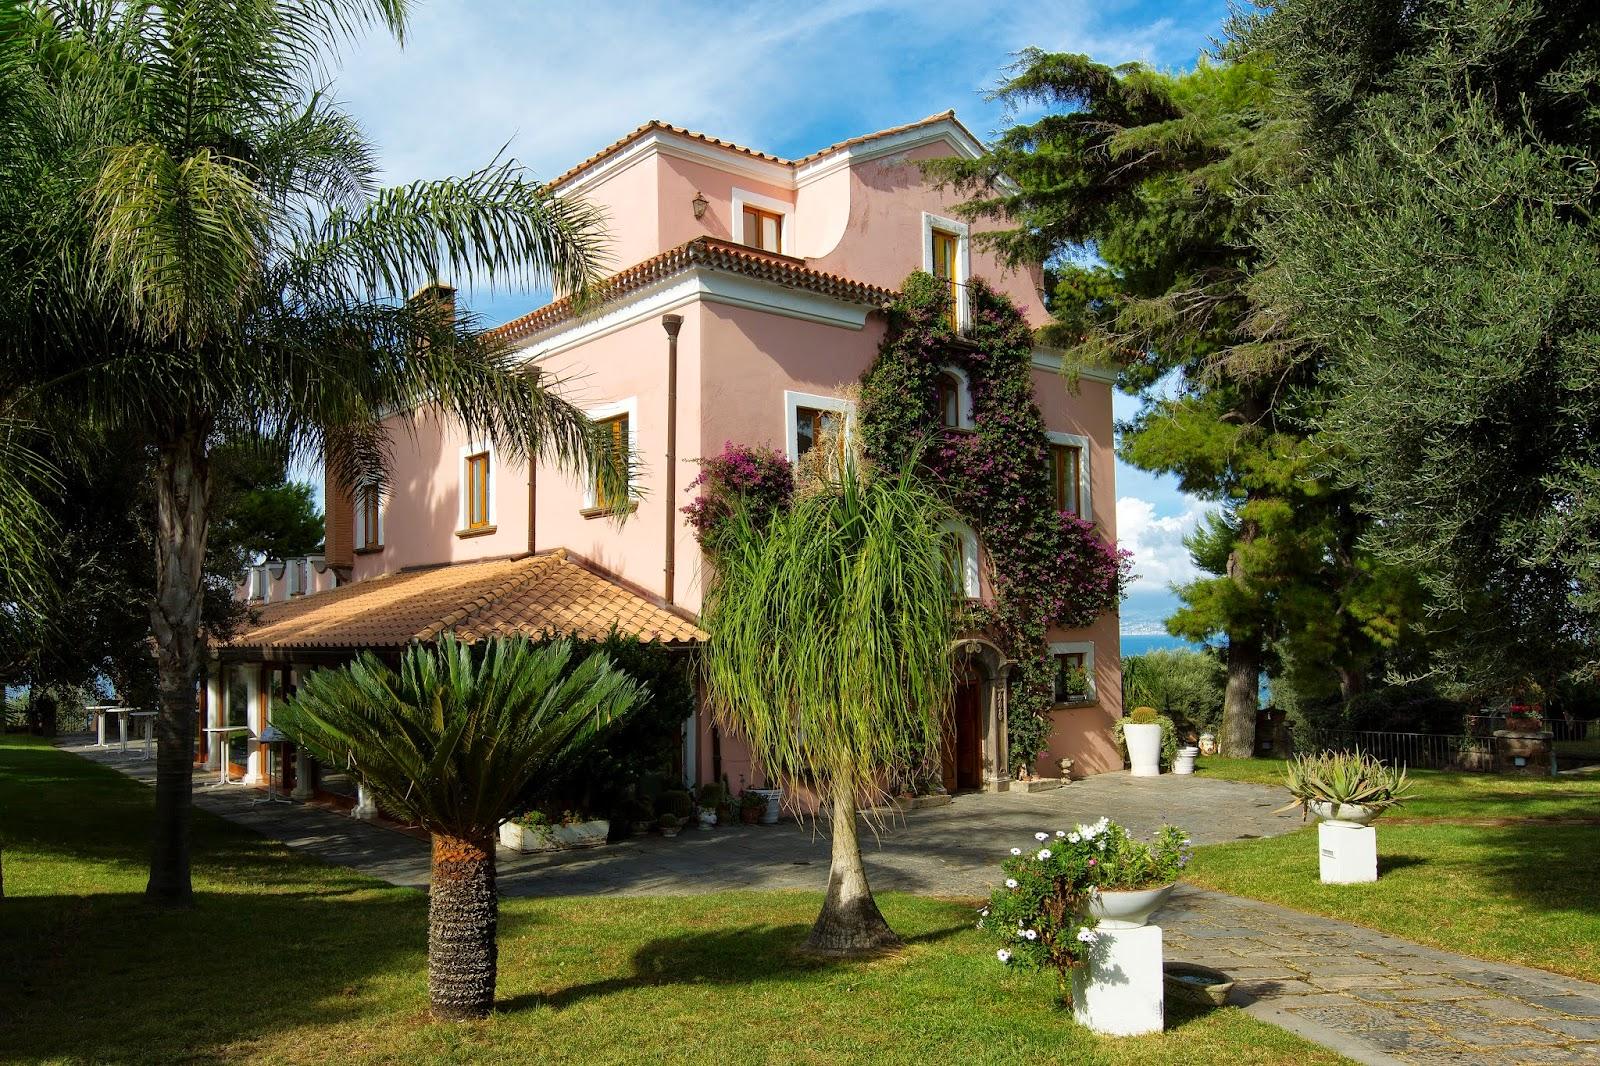 Villa Capo Santa Fortunata, Sorrento, Italy